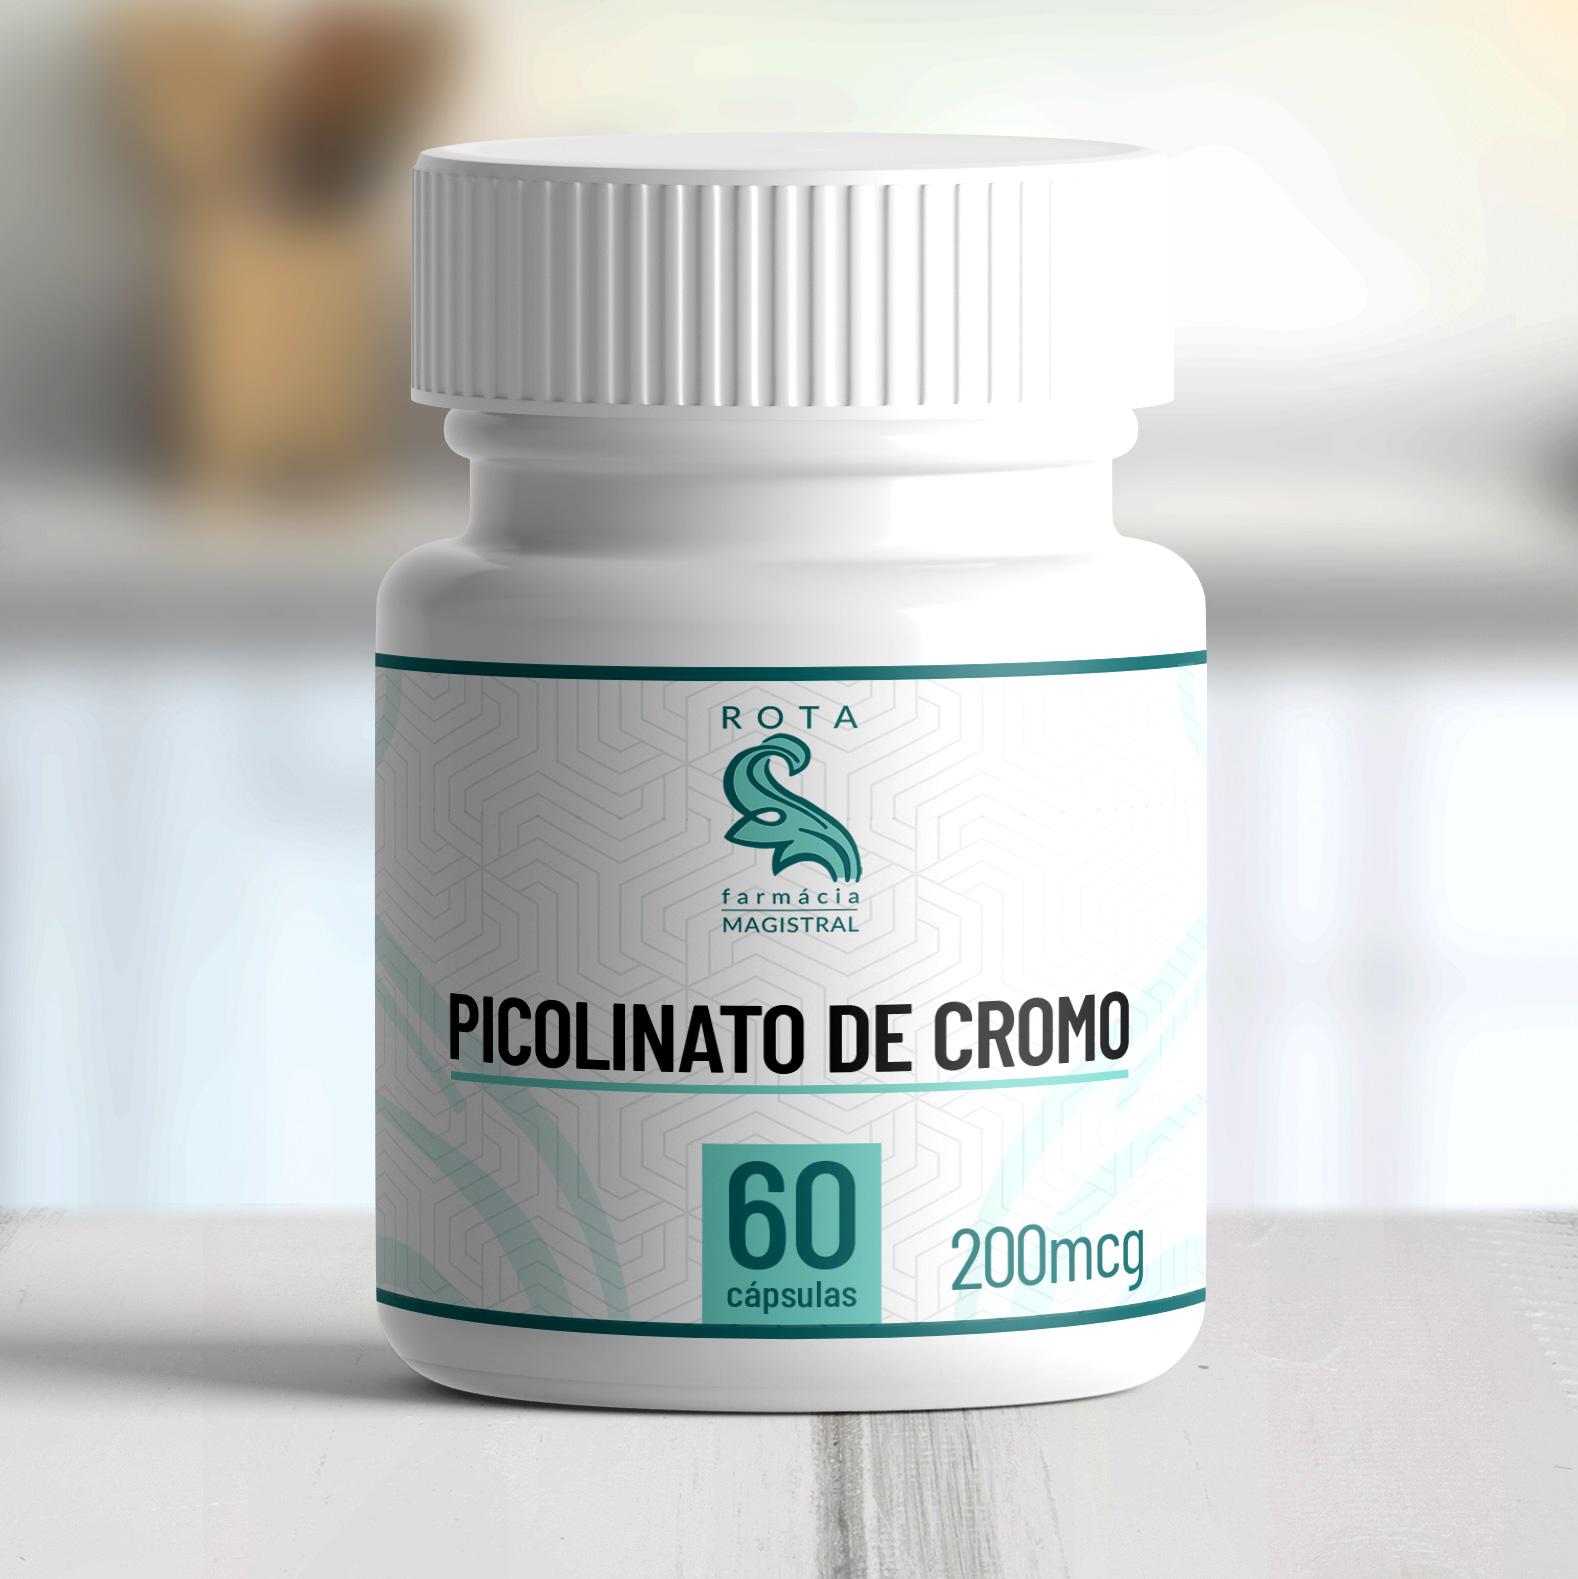 Picolinato de Cromo 200mcg 120 cápsulas